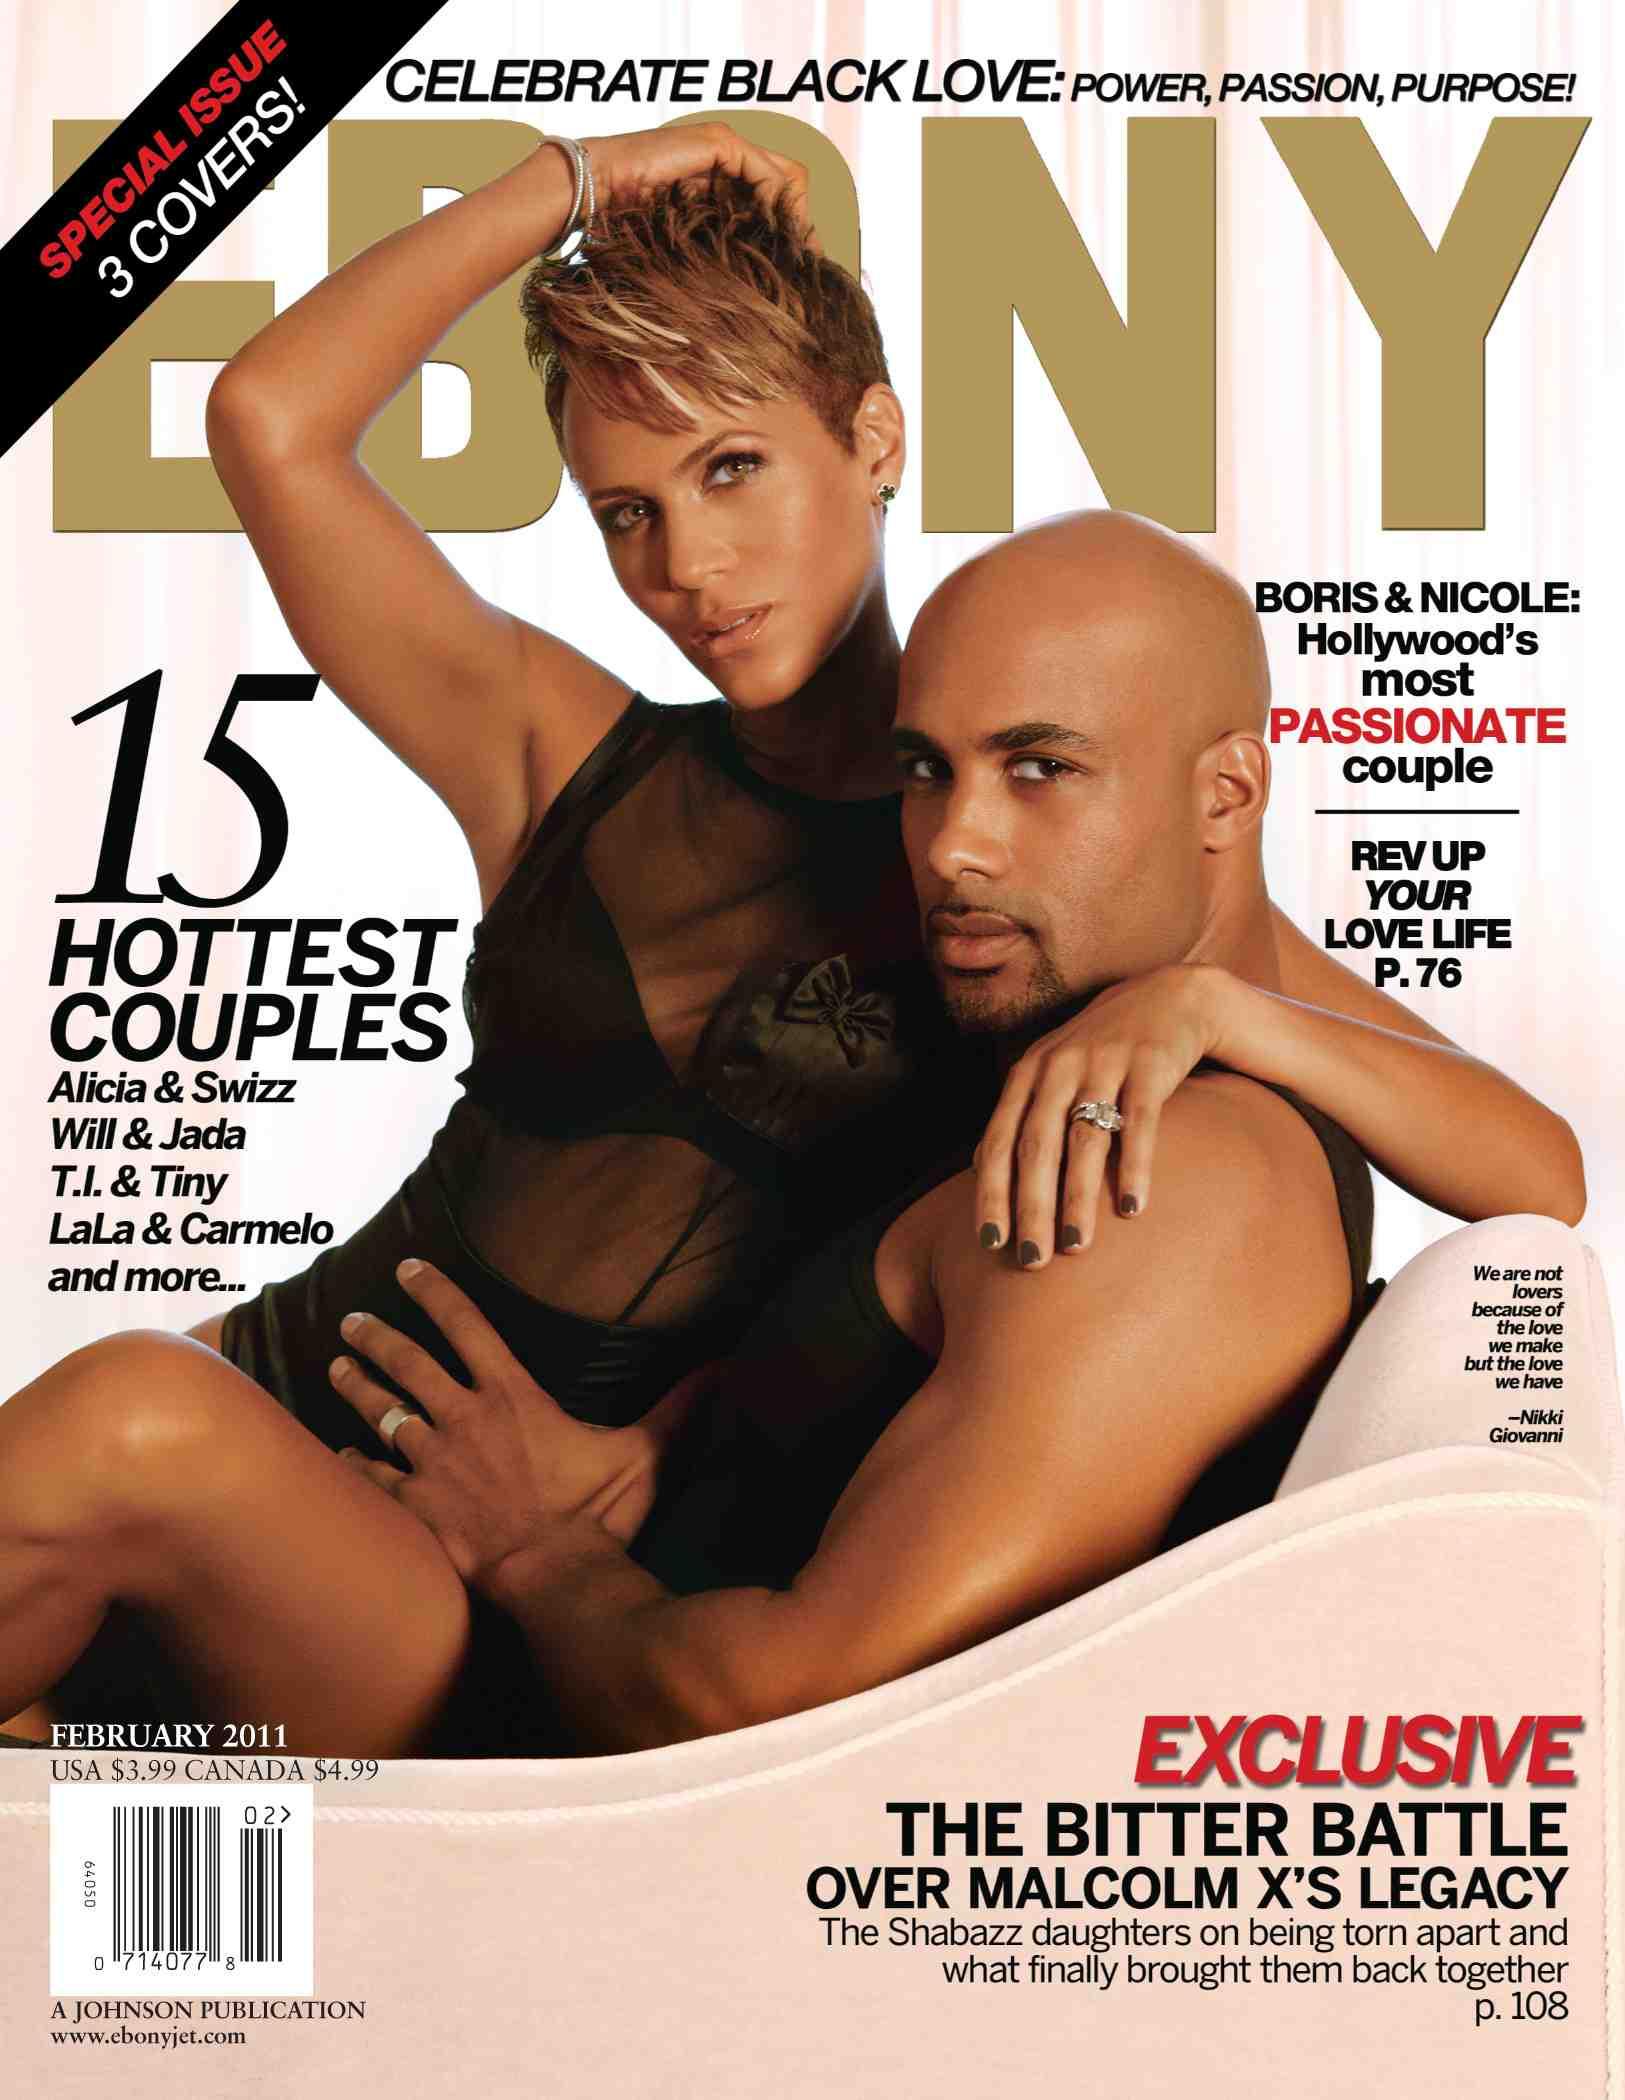 GAIL: Black love ebony magazine covers